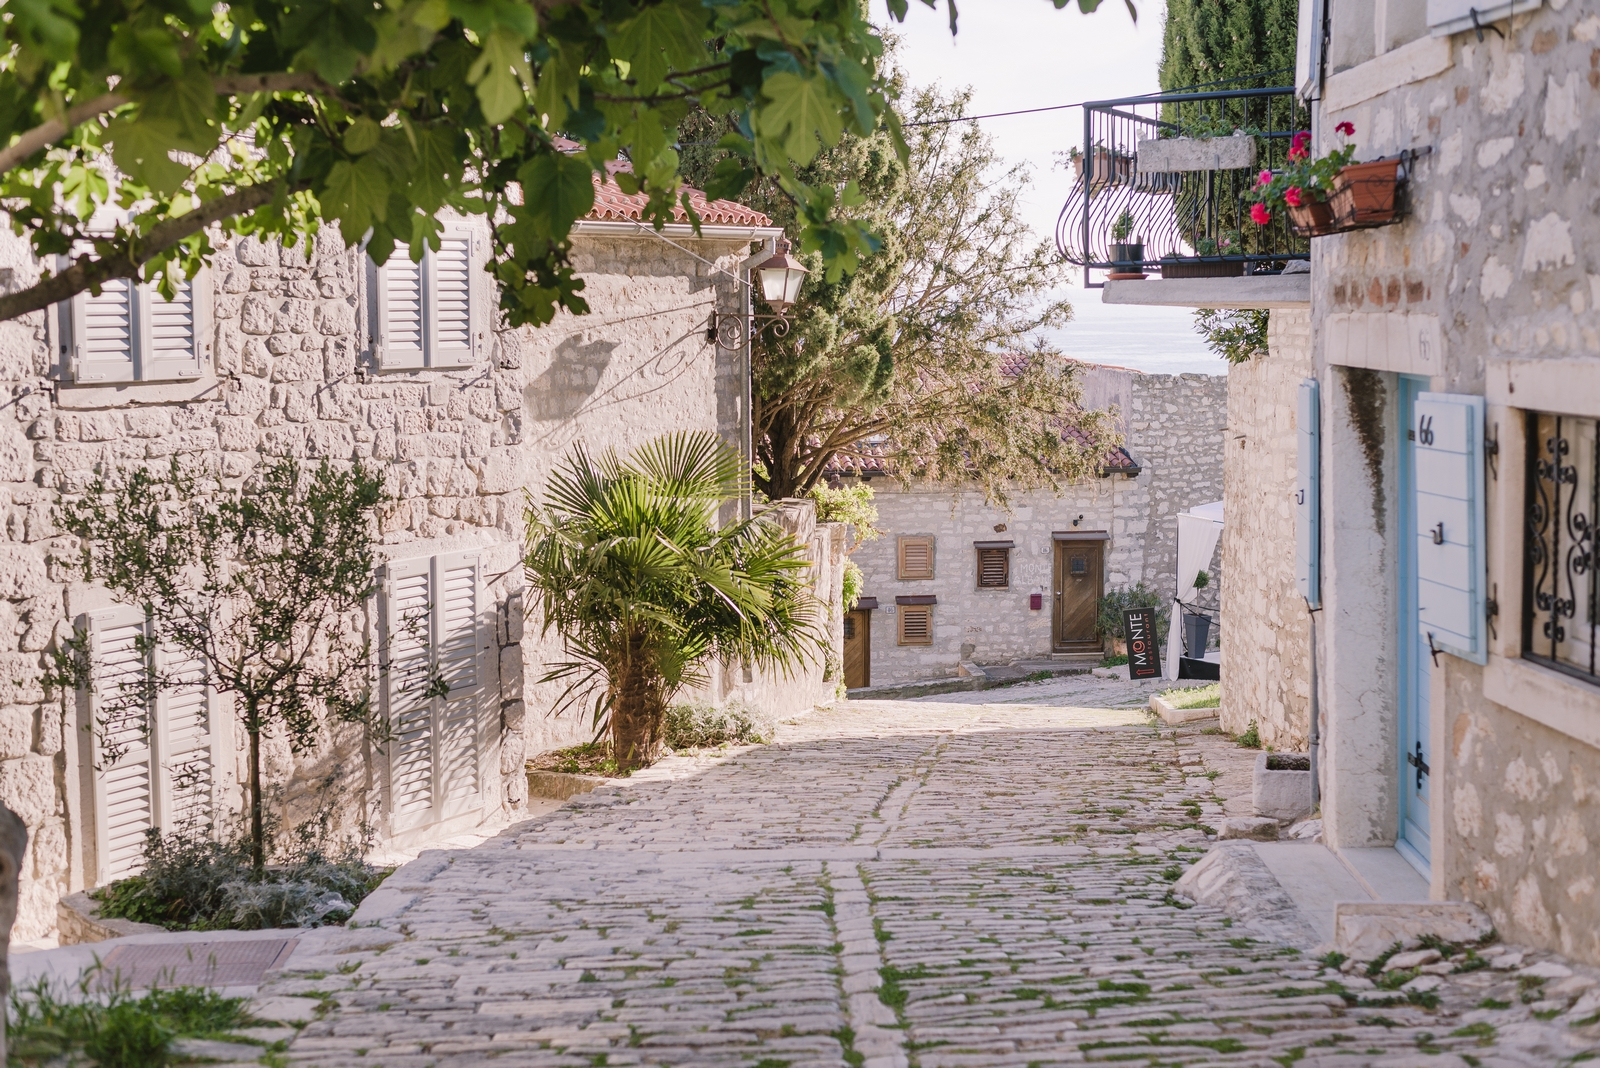 A street near the church of St. Euphemia, Rovinj, Croatia - from travel blog http://Epepa.eu